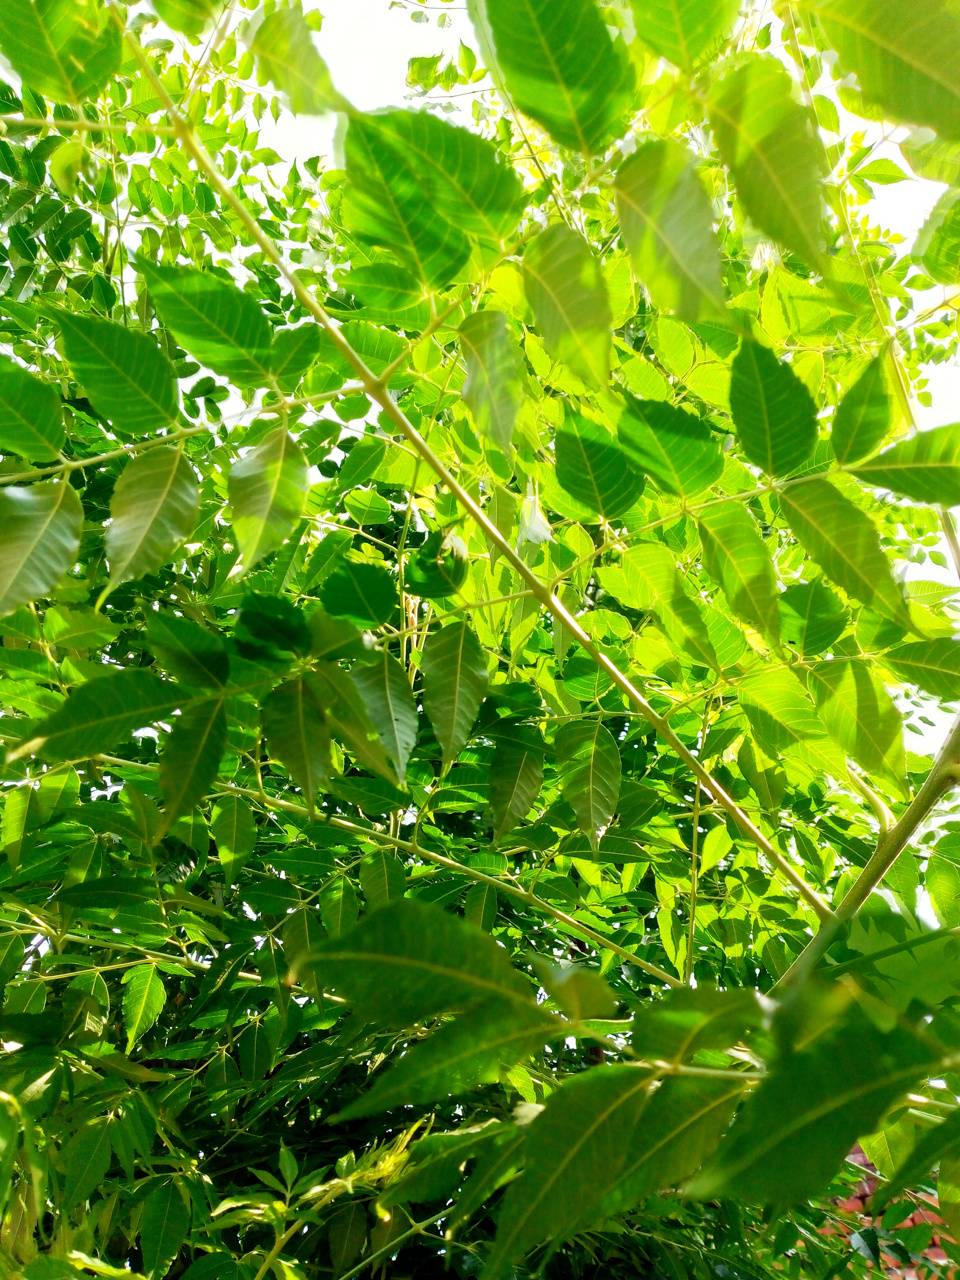 Chinese Neem leaf